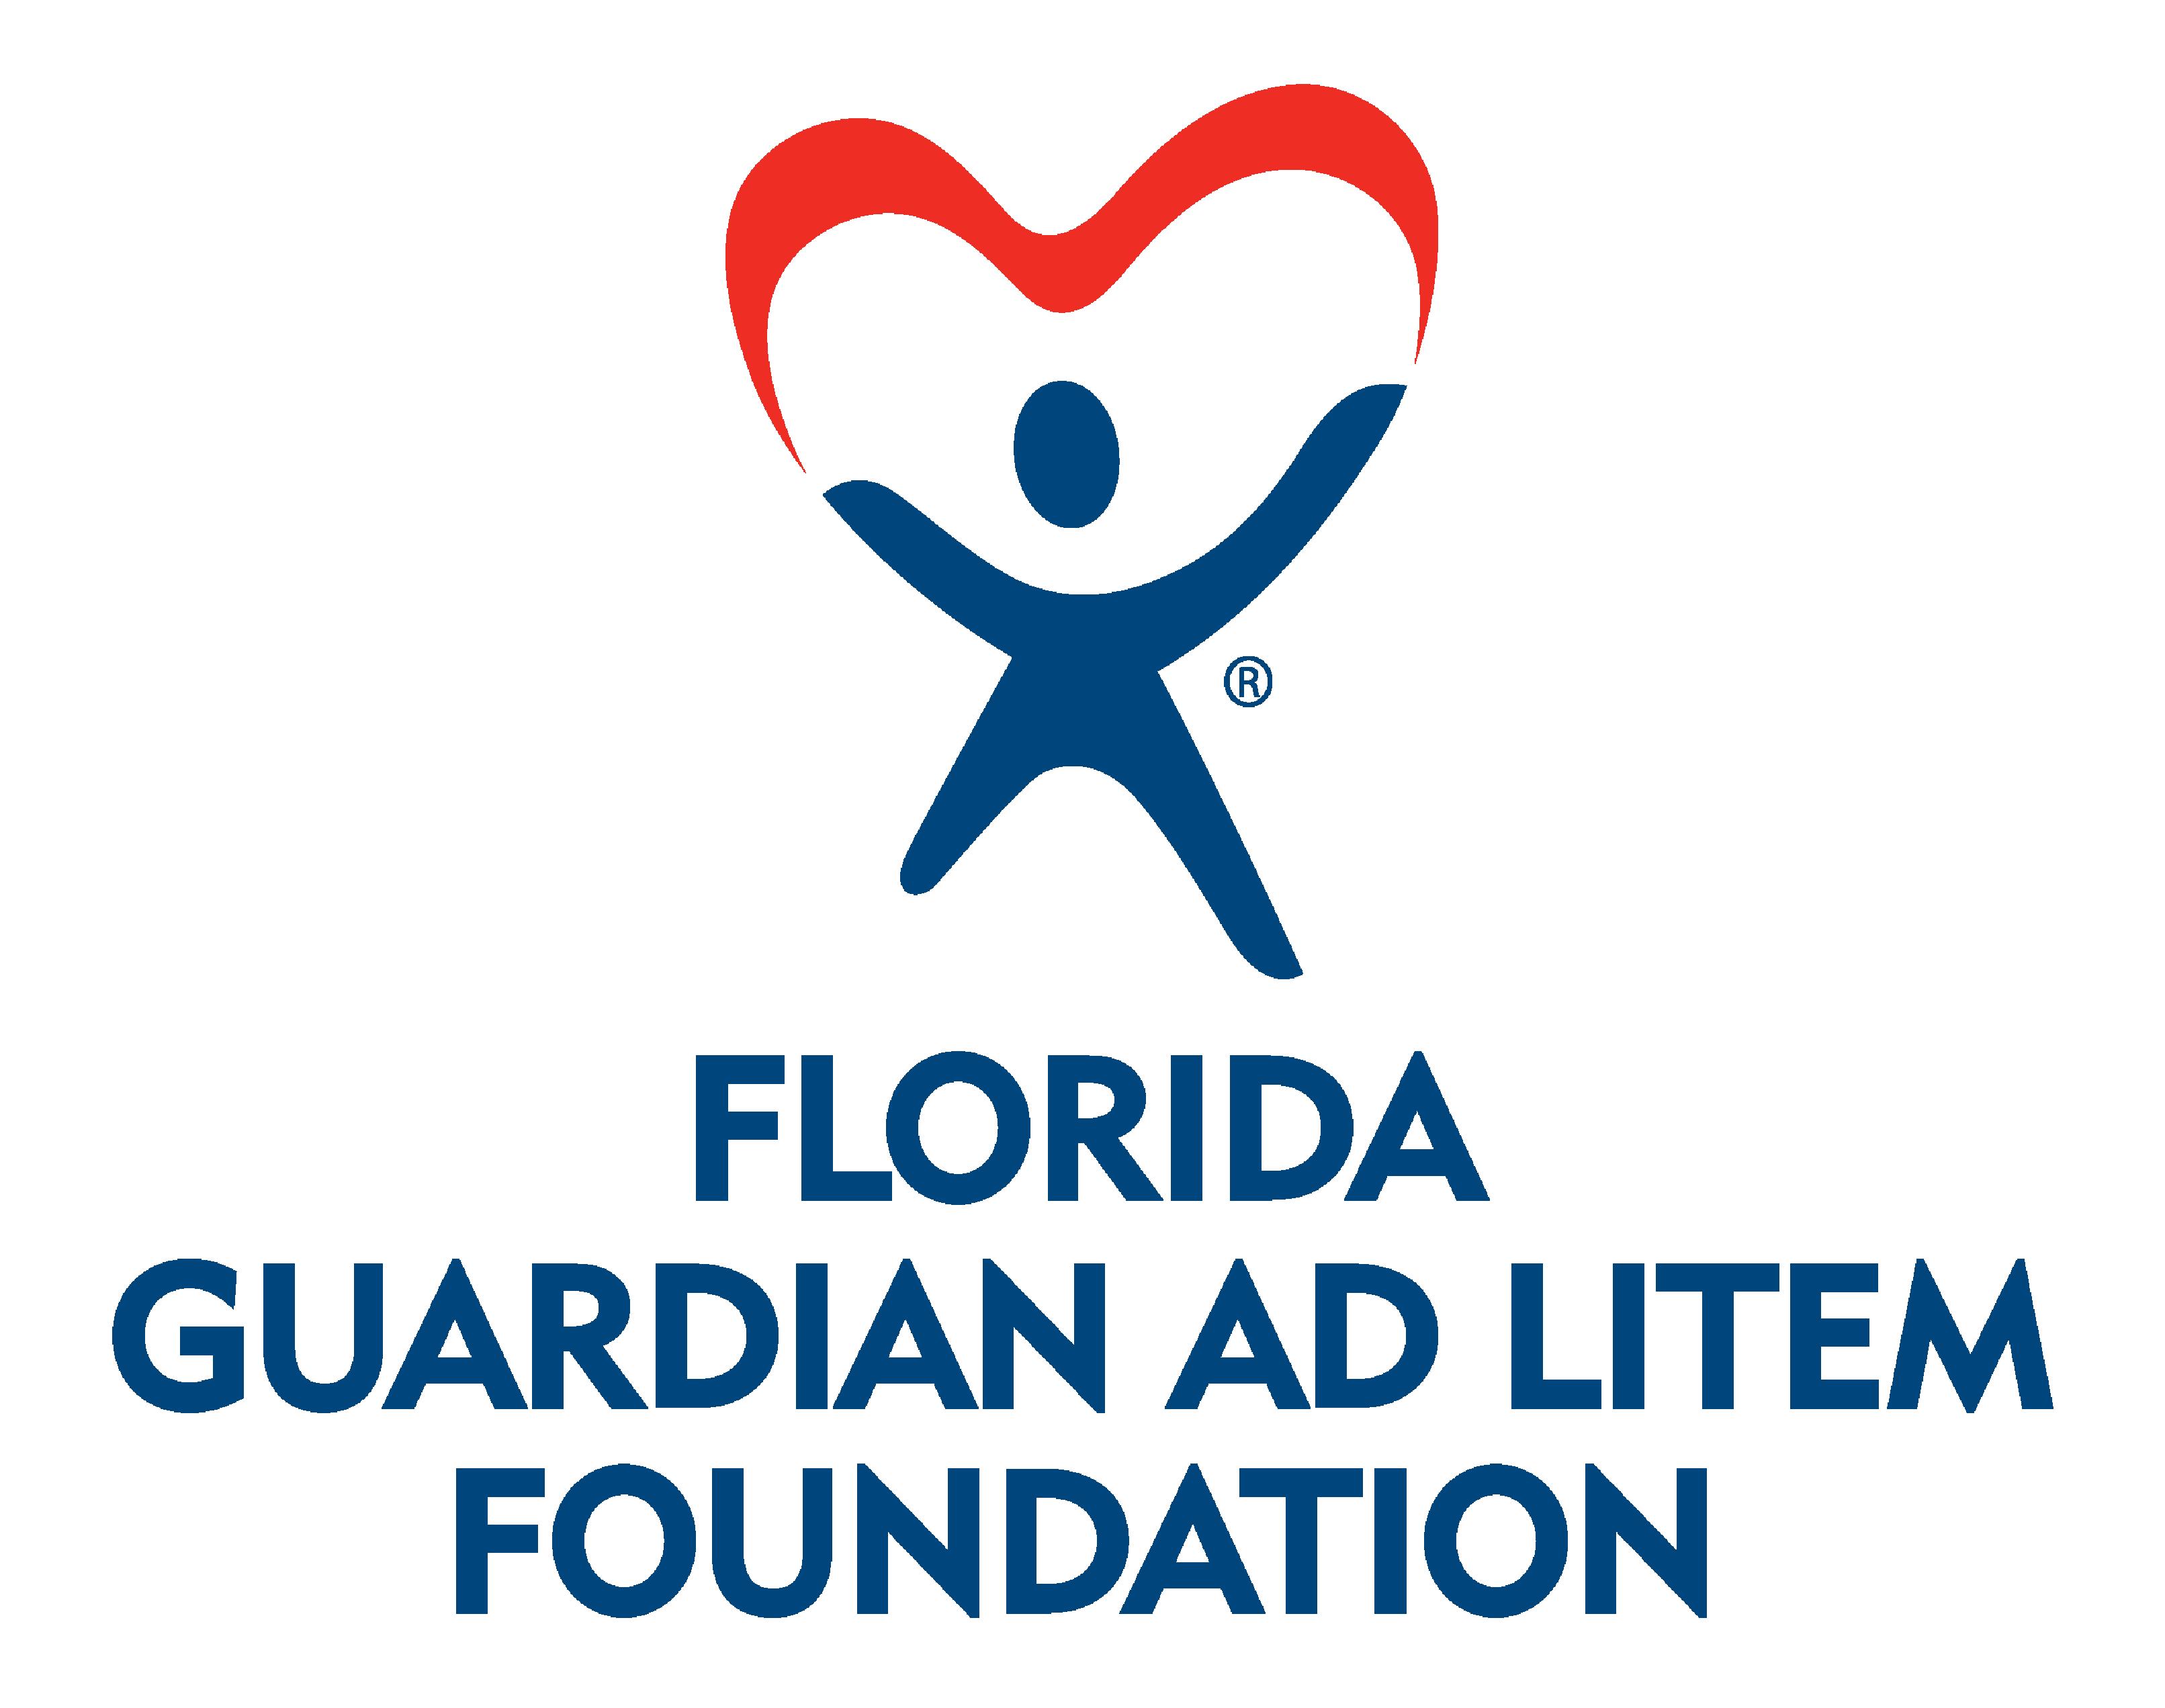 Florida Guardian ad Litem Foundation